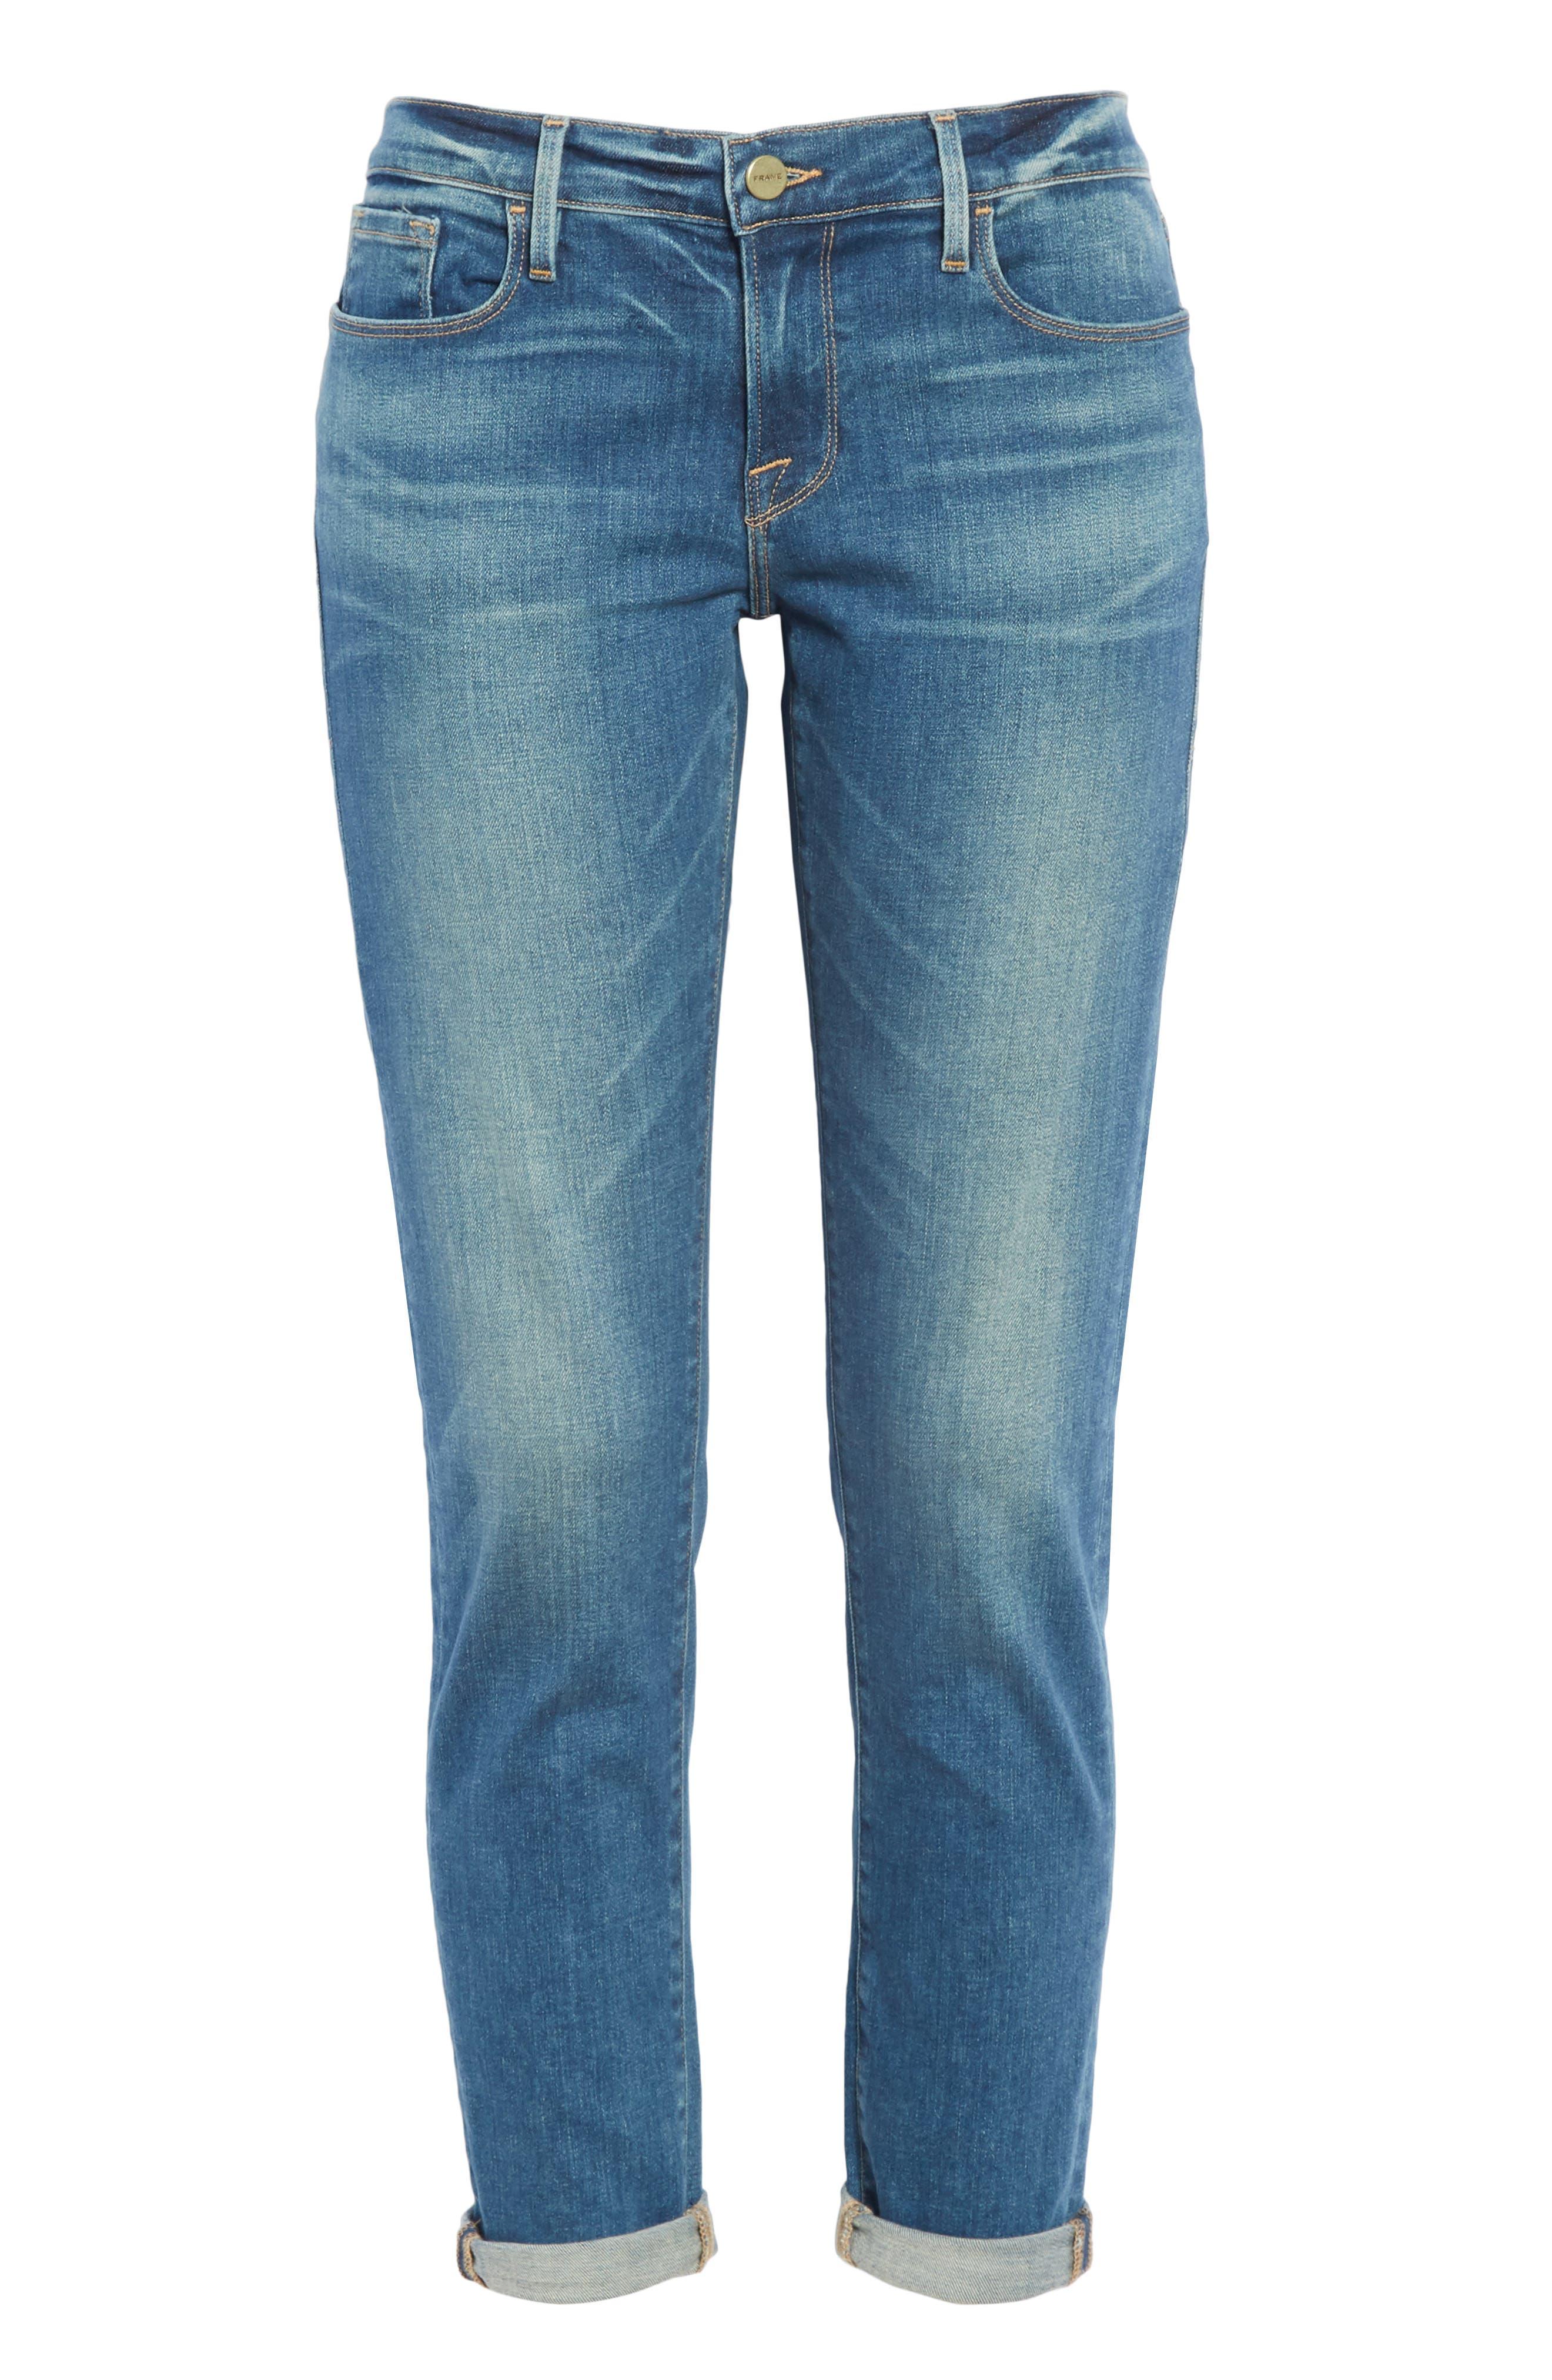 Le Garcon Slim Boyfriend Jeans,                             Alternate thumbnail 7, color,                             BERKLEY SQUARE